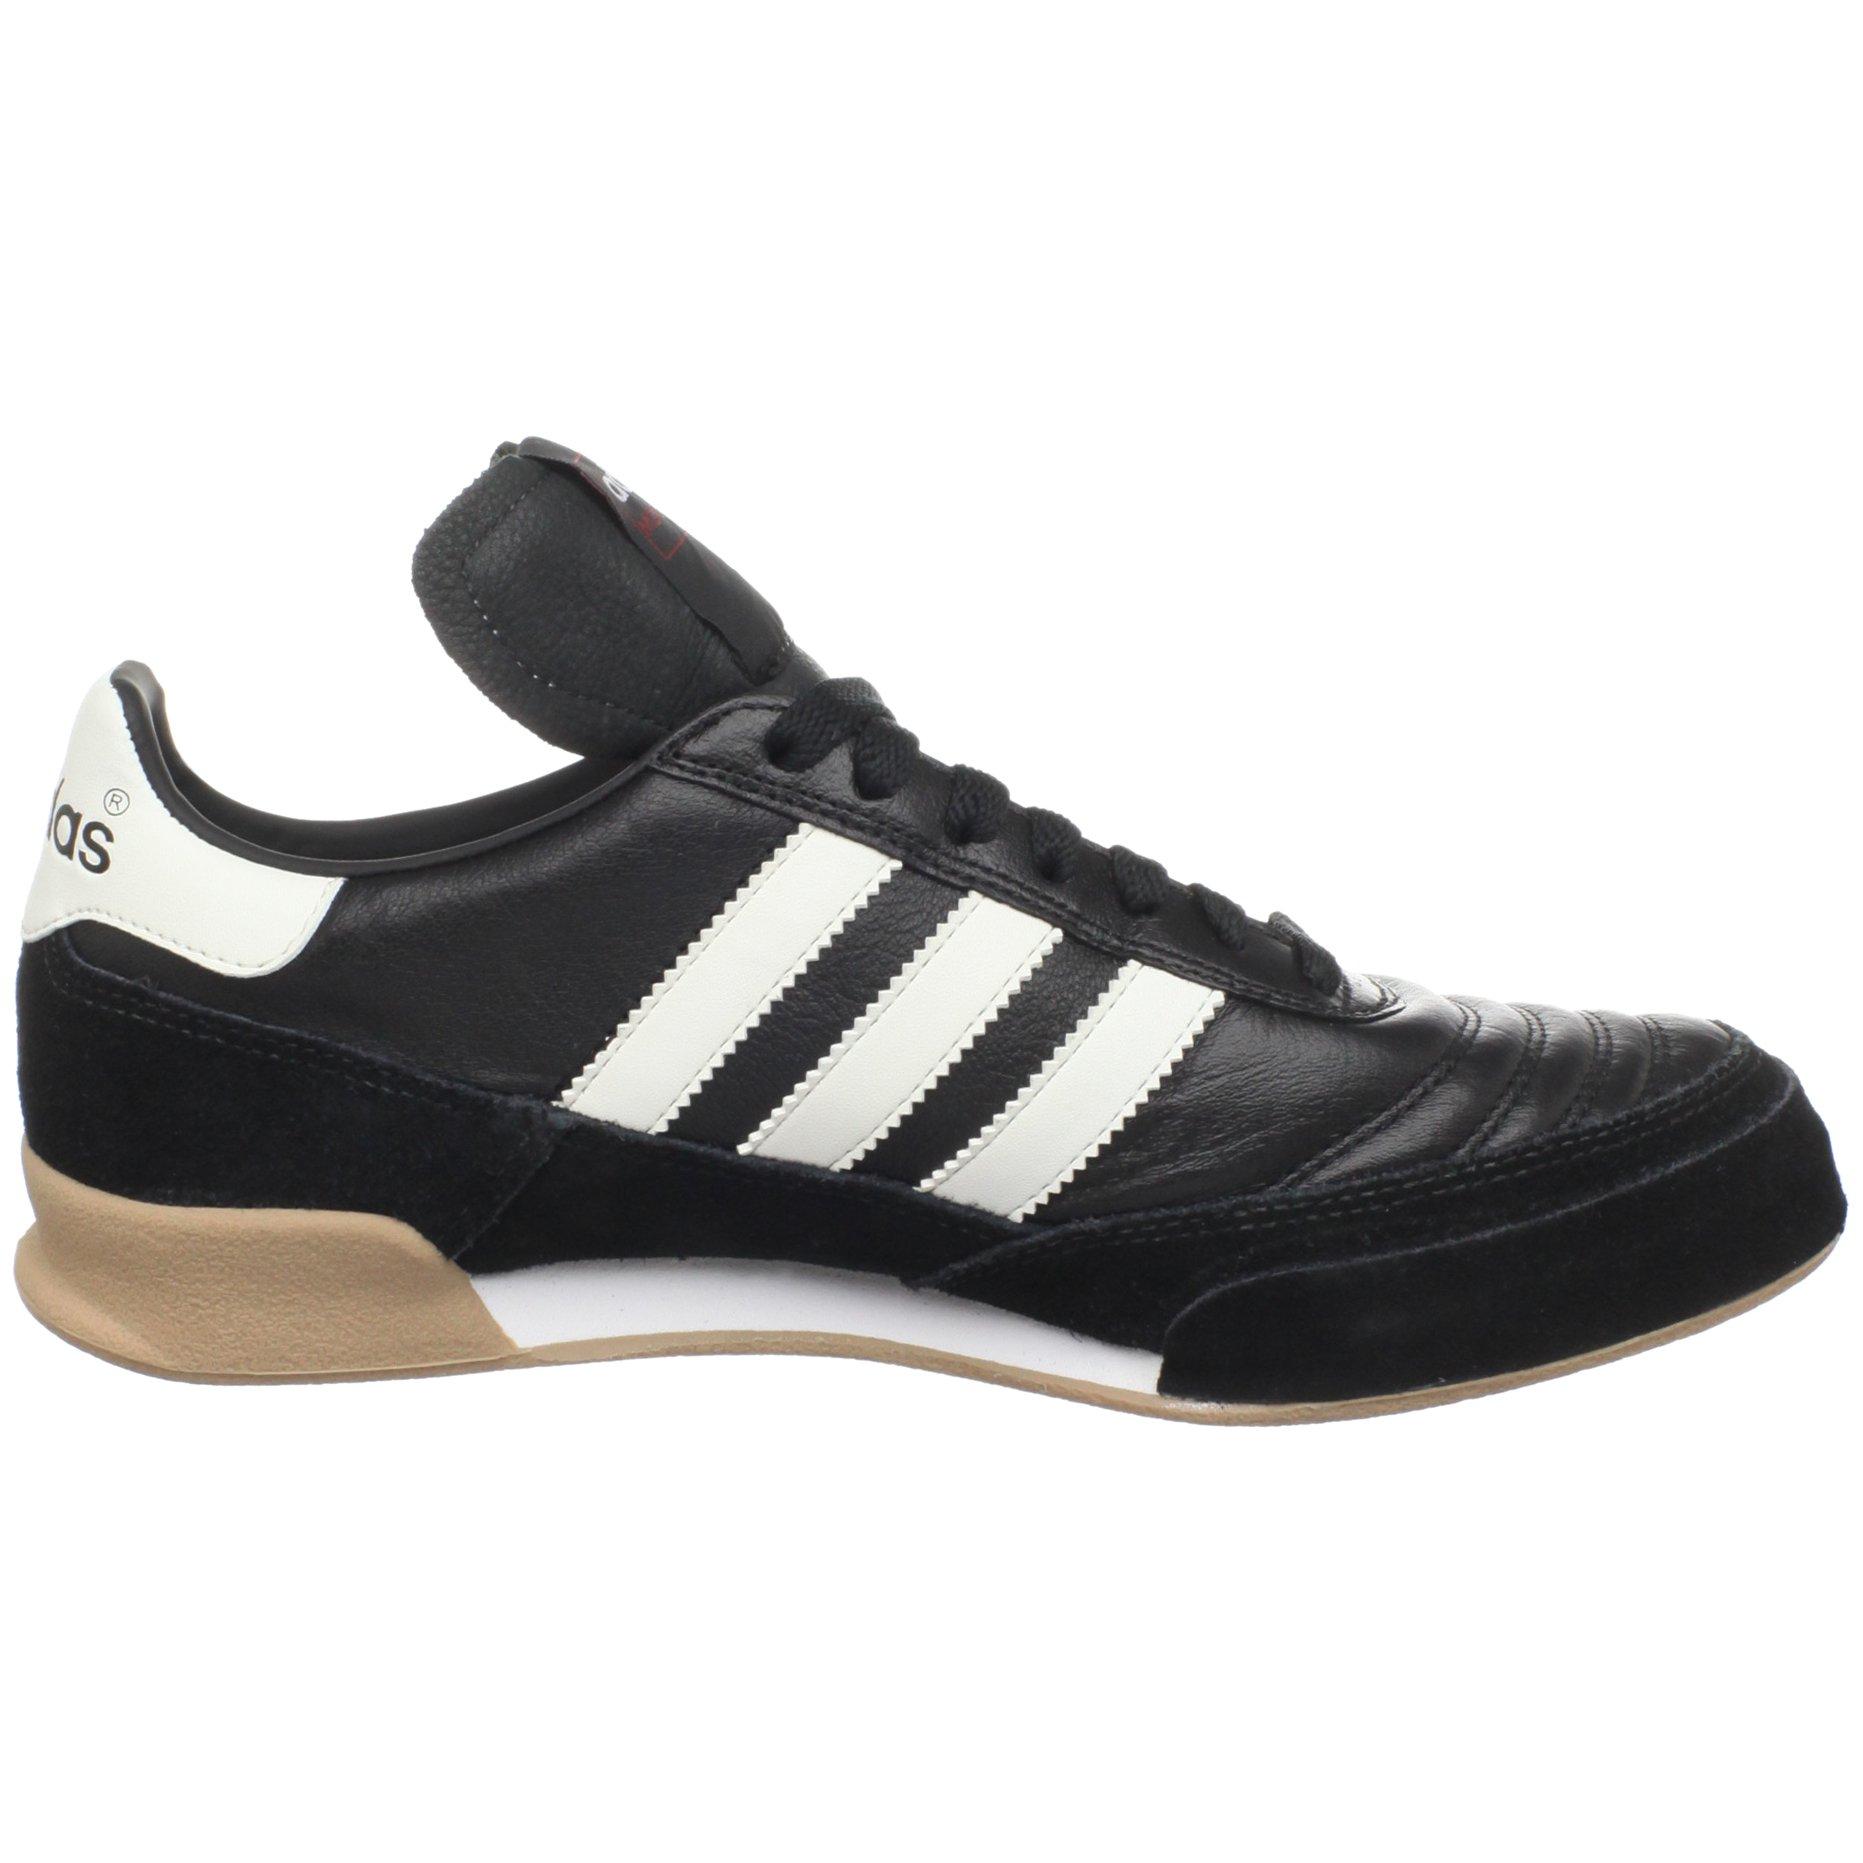 adidas Men's Mundial Goal Soccer Cleat, Black/White/White, 5 M US by adidas (Image #6)